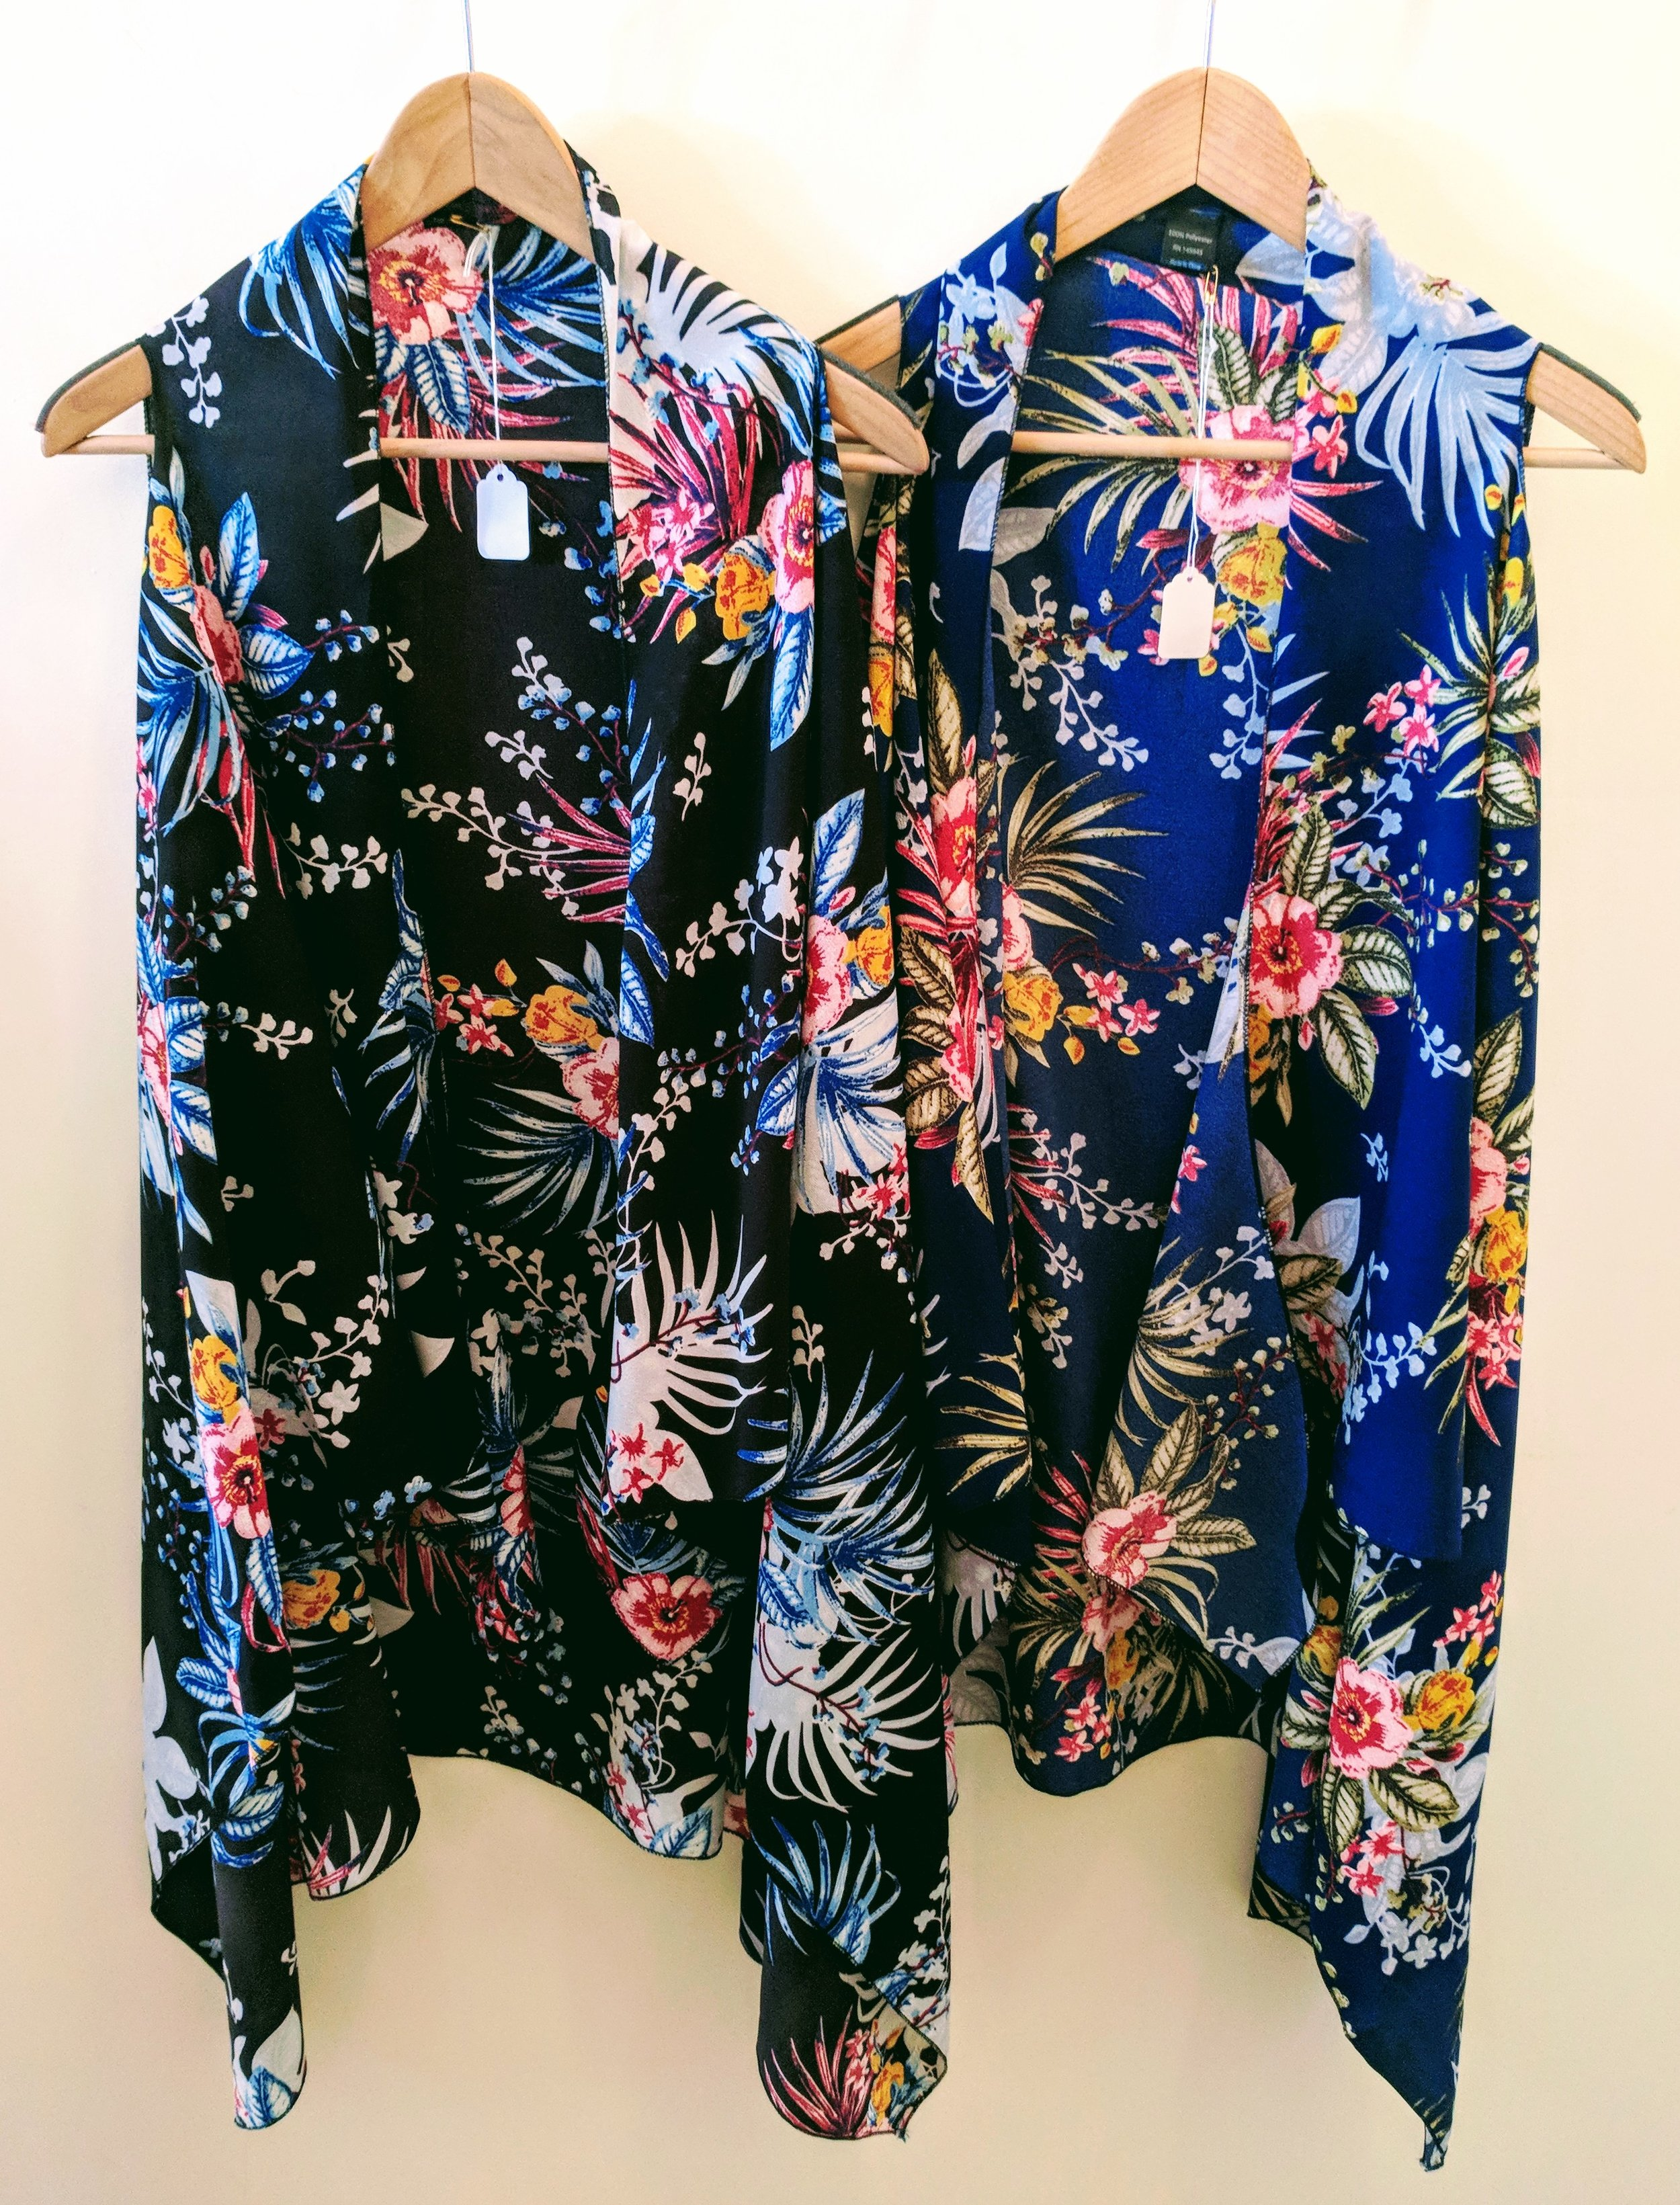 Black and blue tropical pattern kimono vest.